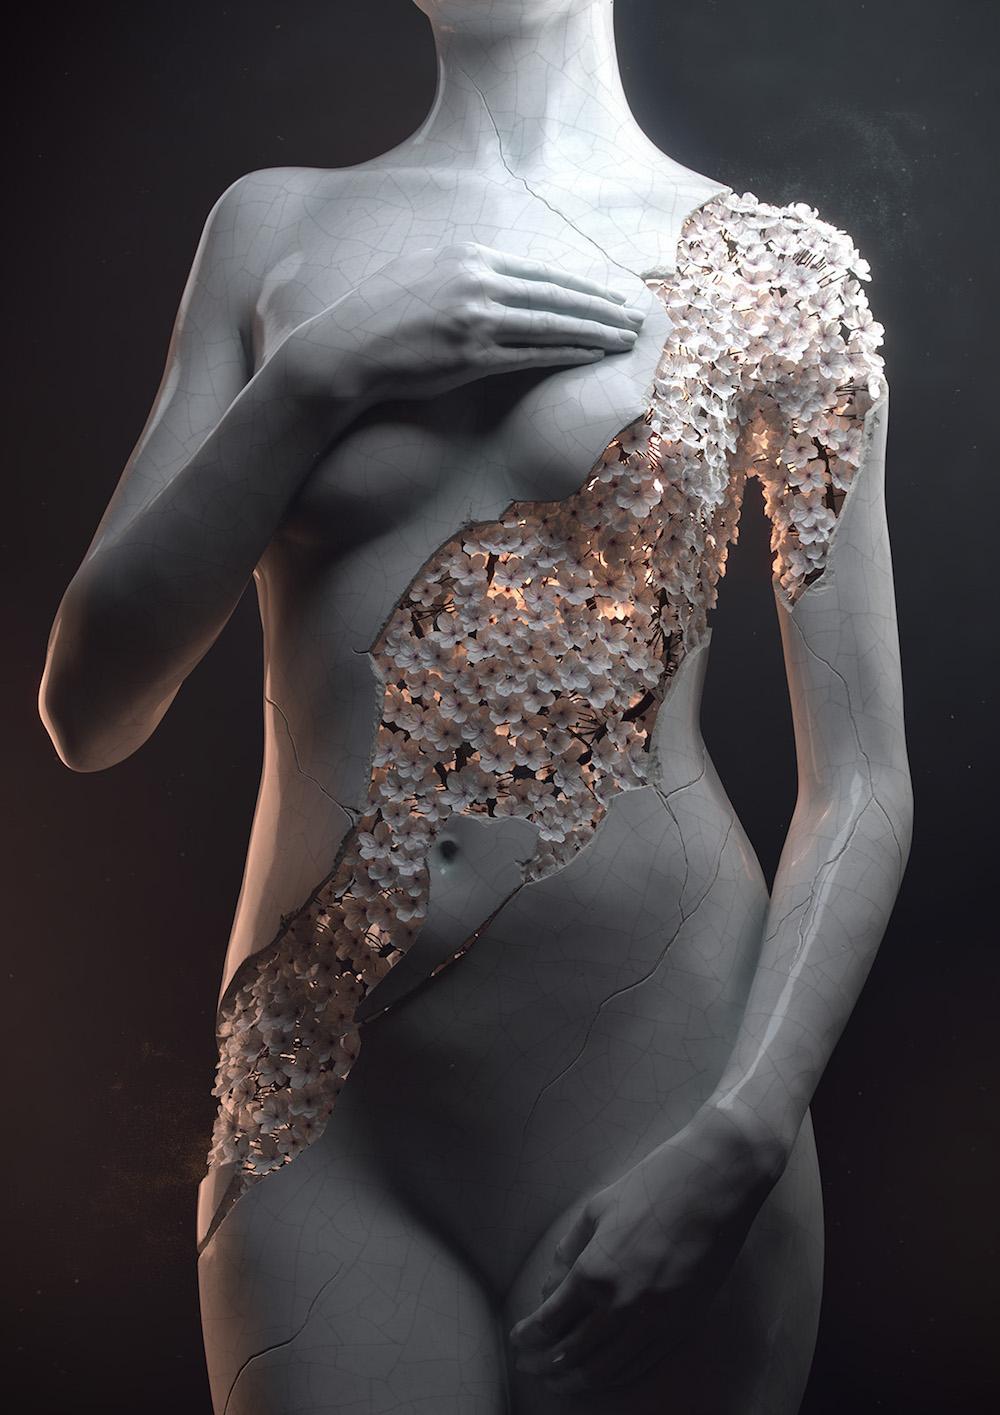 All images via J ean-Michel Bihorel French 3D artist Jean-Michel Bihorel has been rendering films f